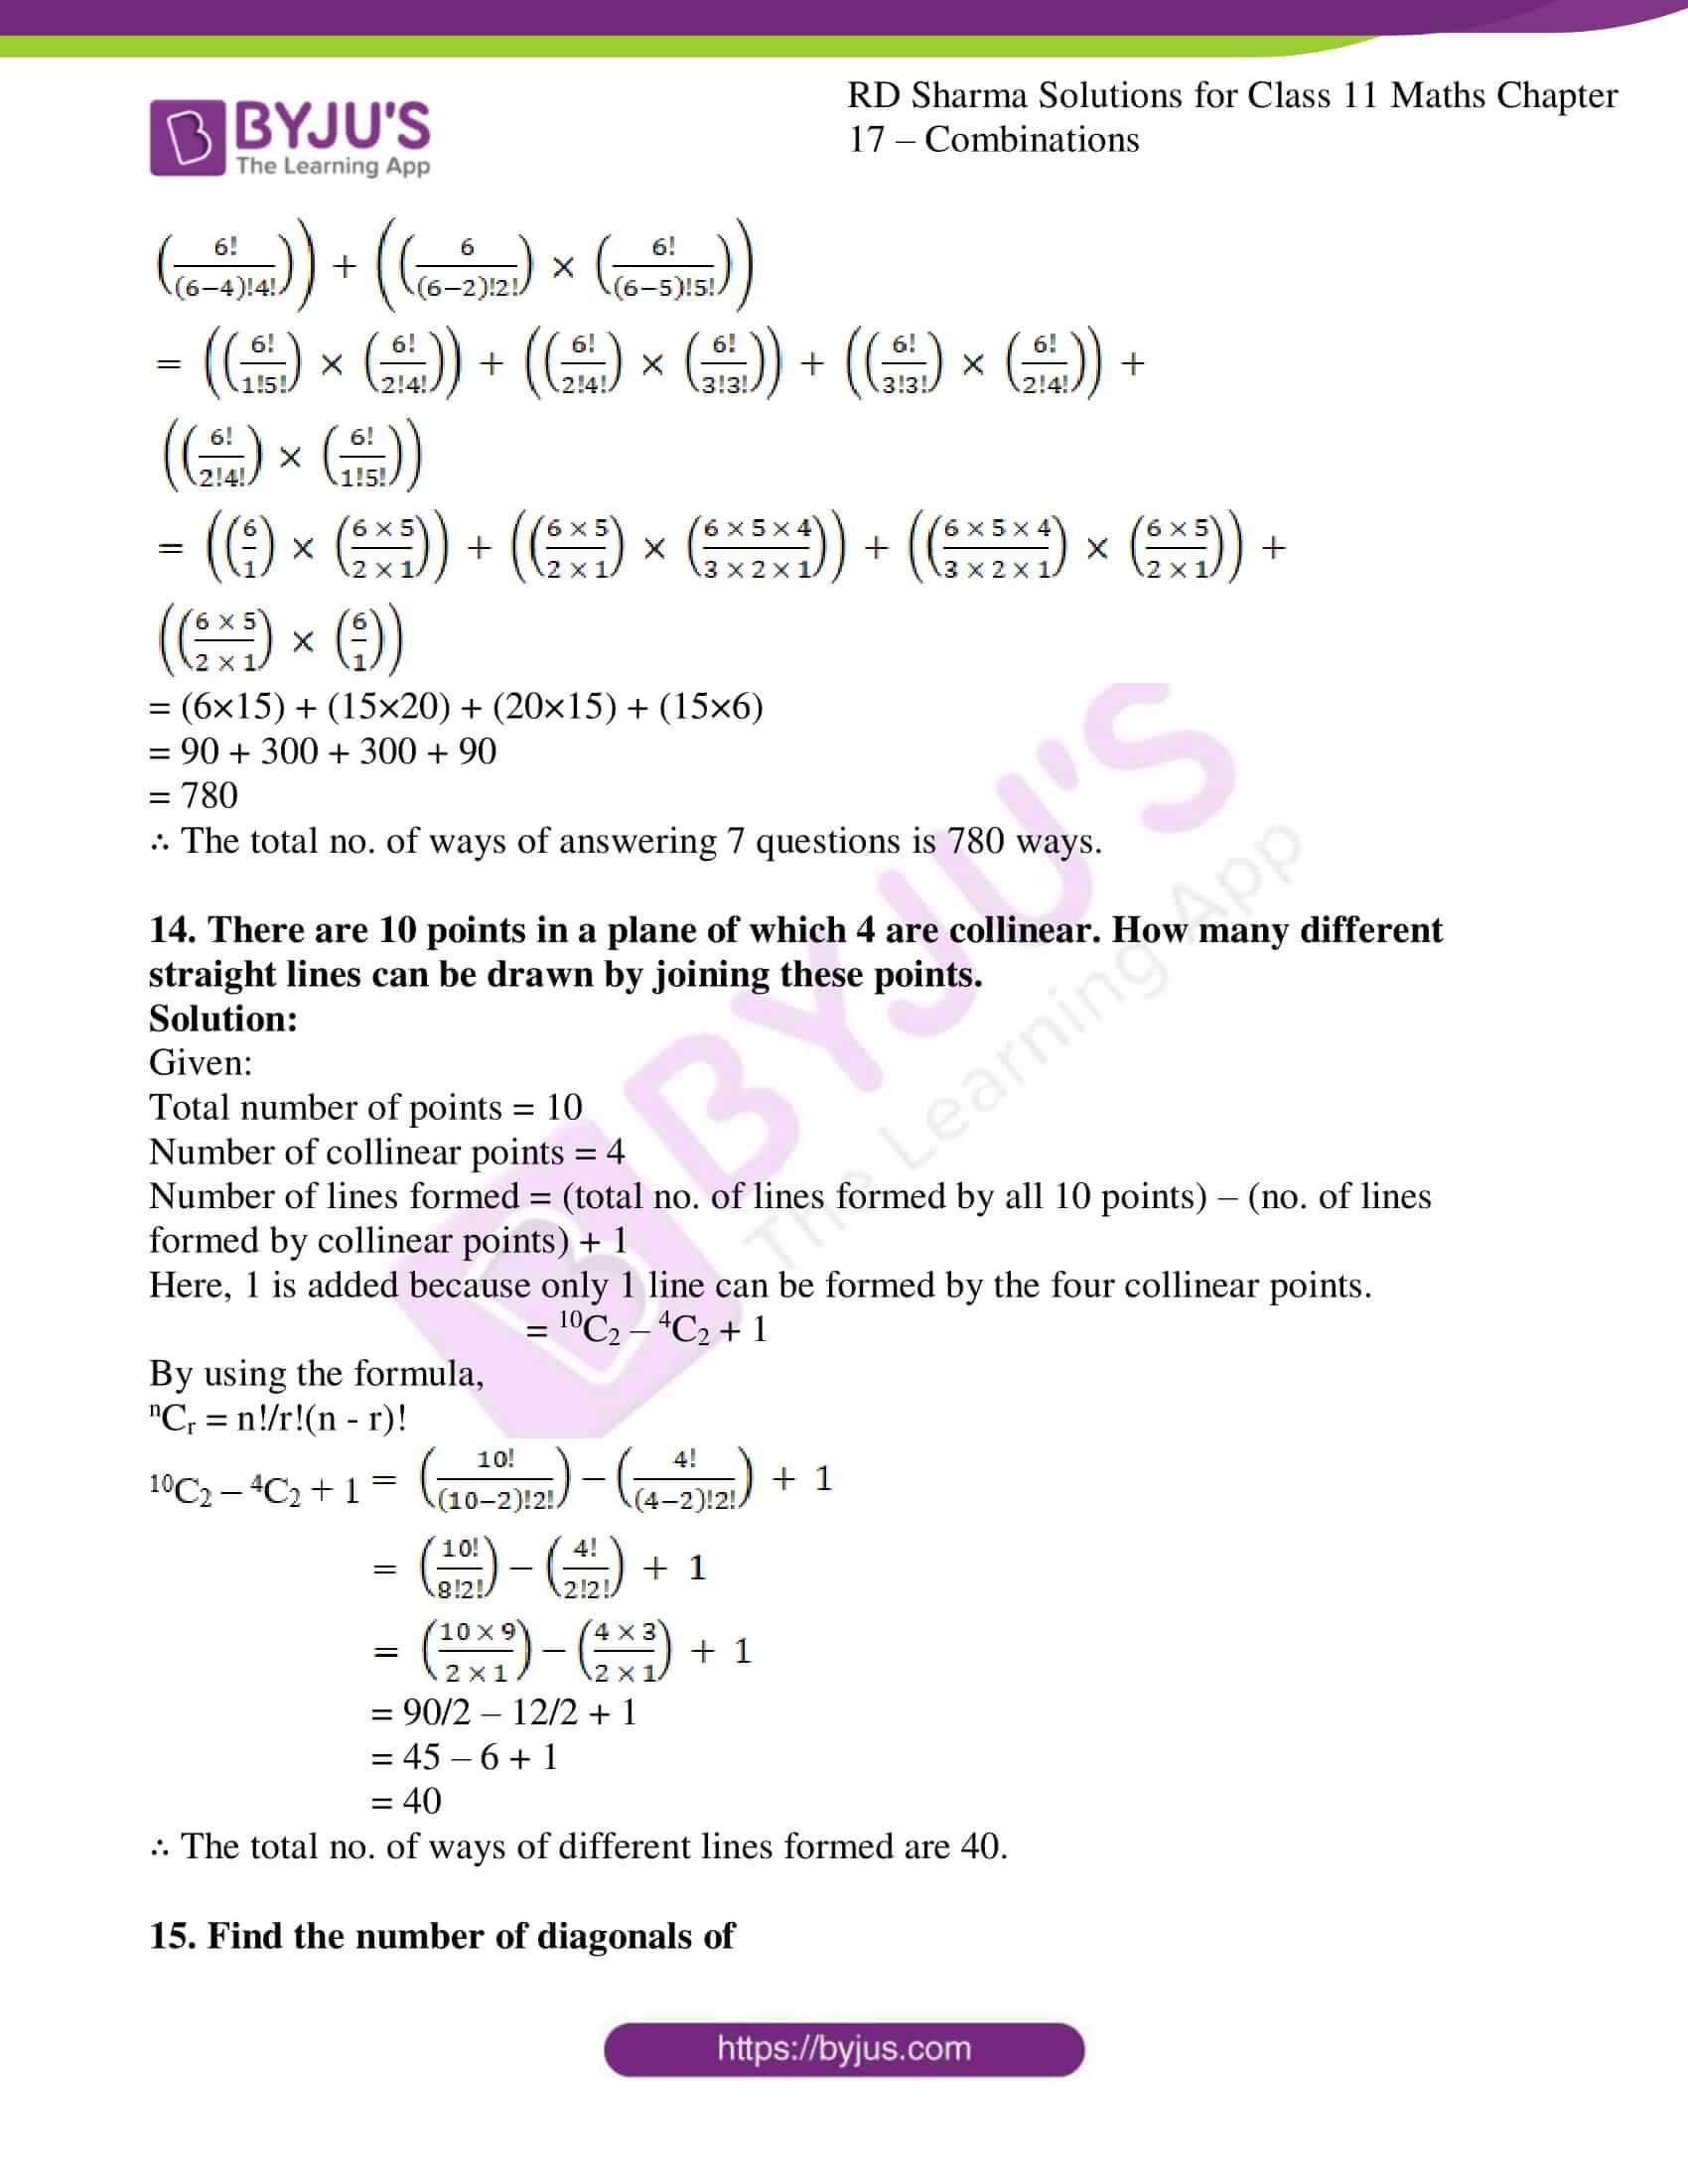 rd sharma class 11 maths ch 17 ex 2 11